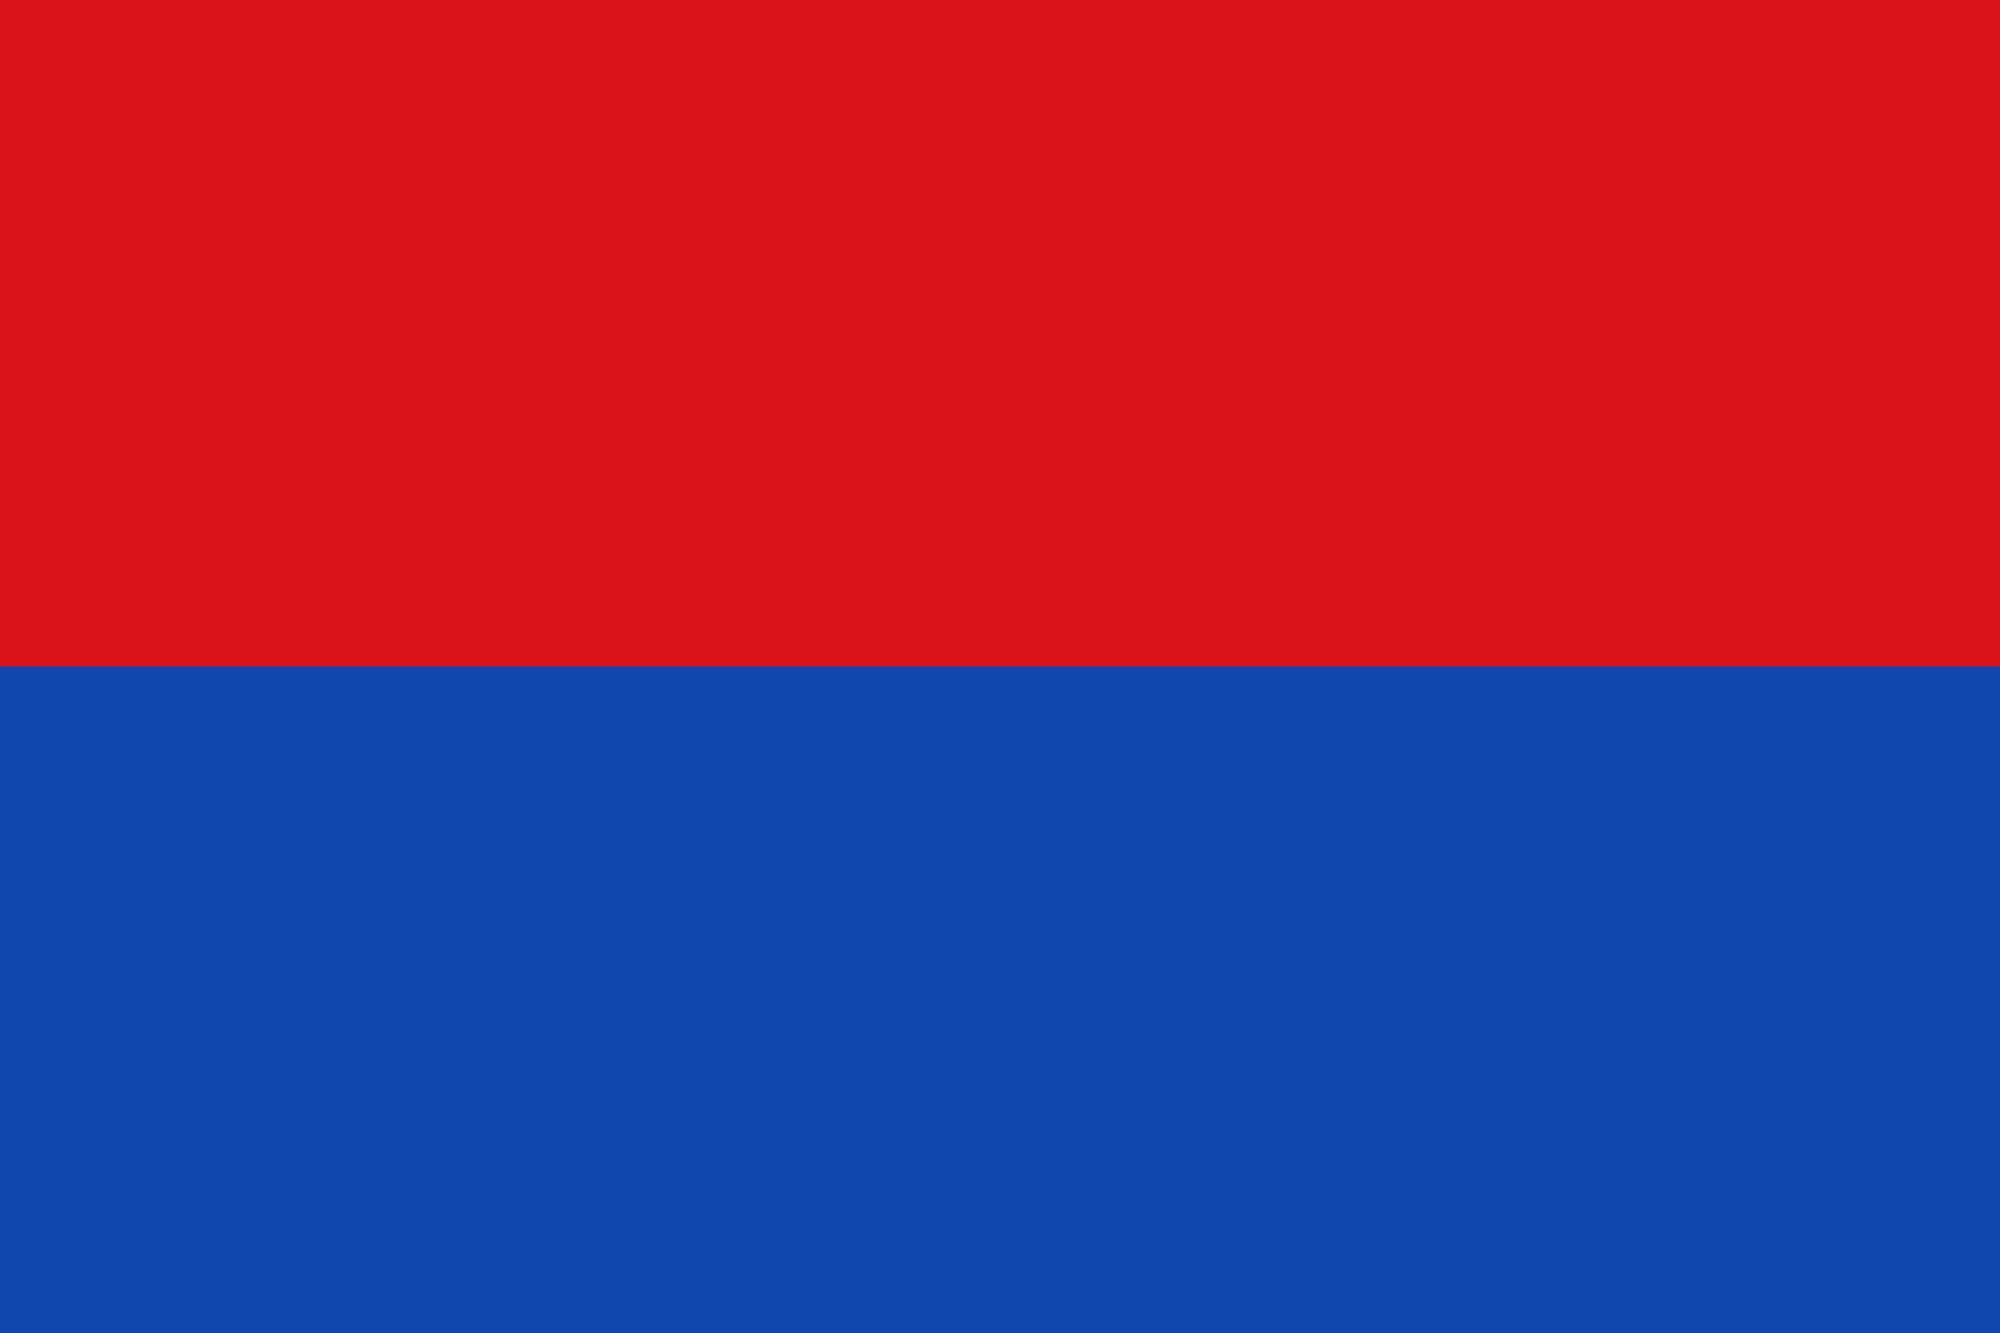 La Puebla Del Rio Equador Bandeiras Bandeiras Do Mundo